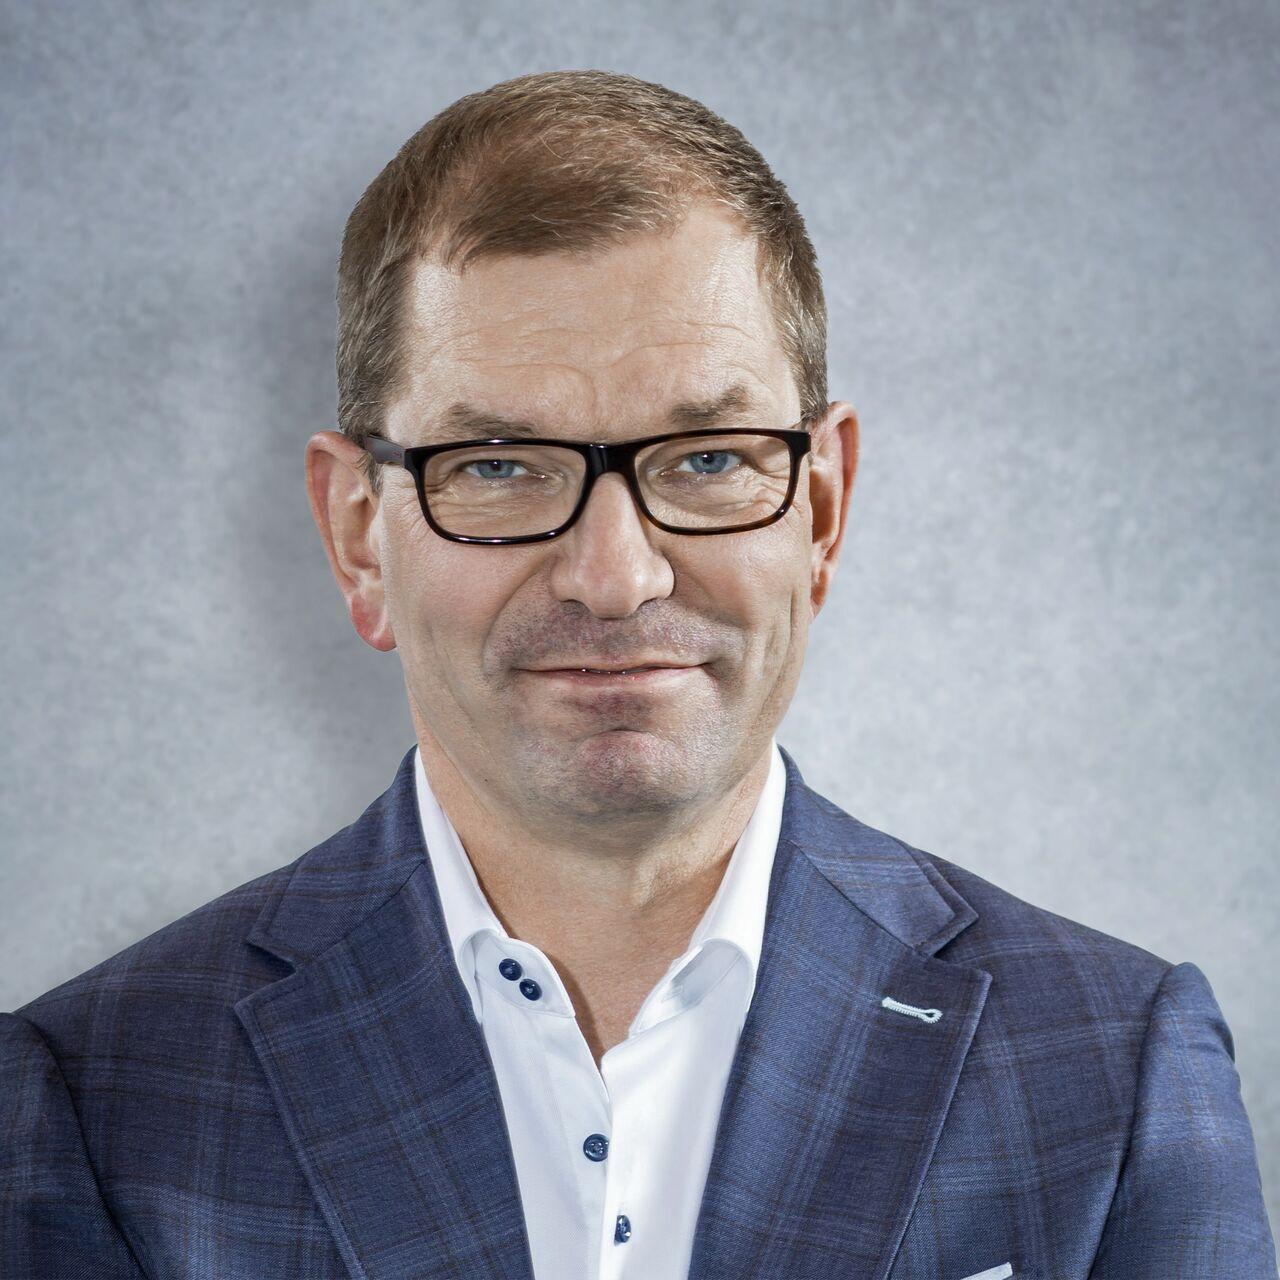 Markus Duesmann - Biography